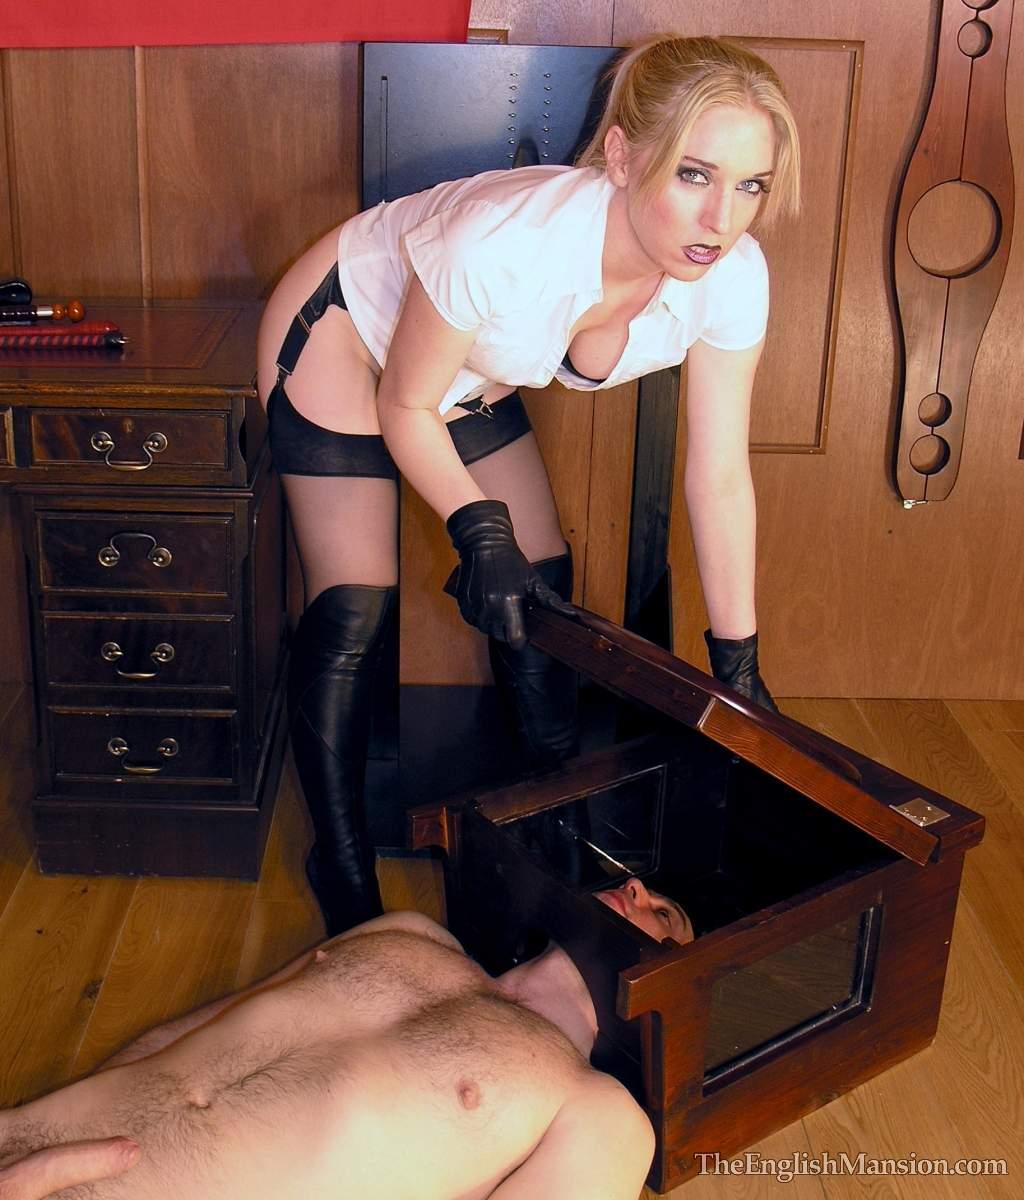 Servant porn pics sexy streaming